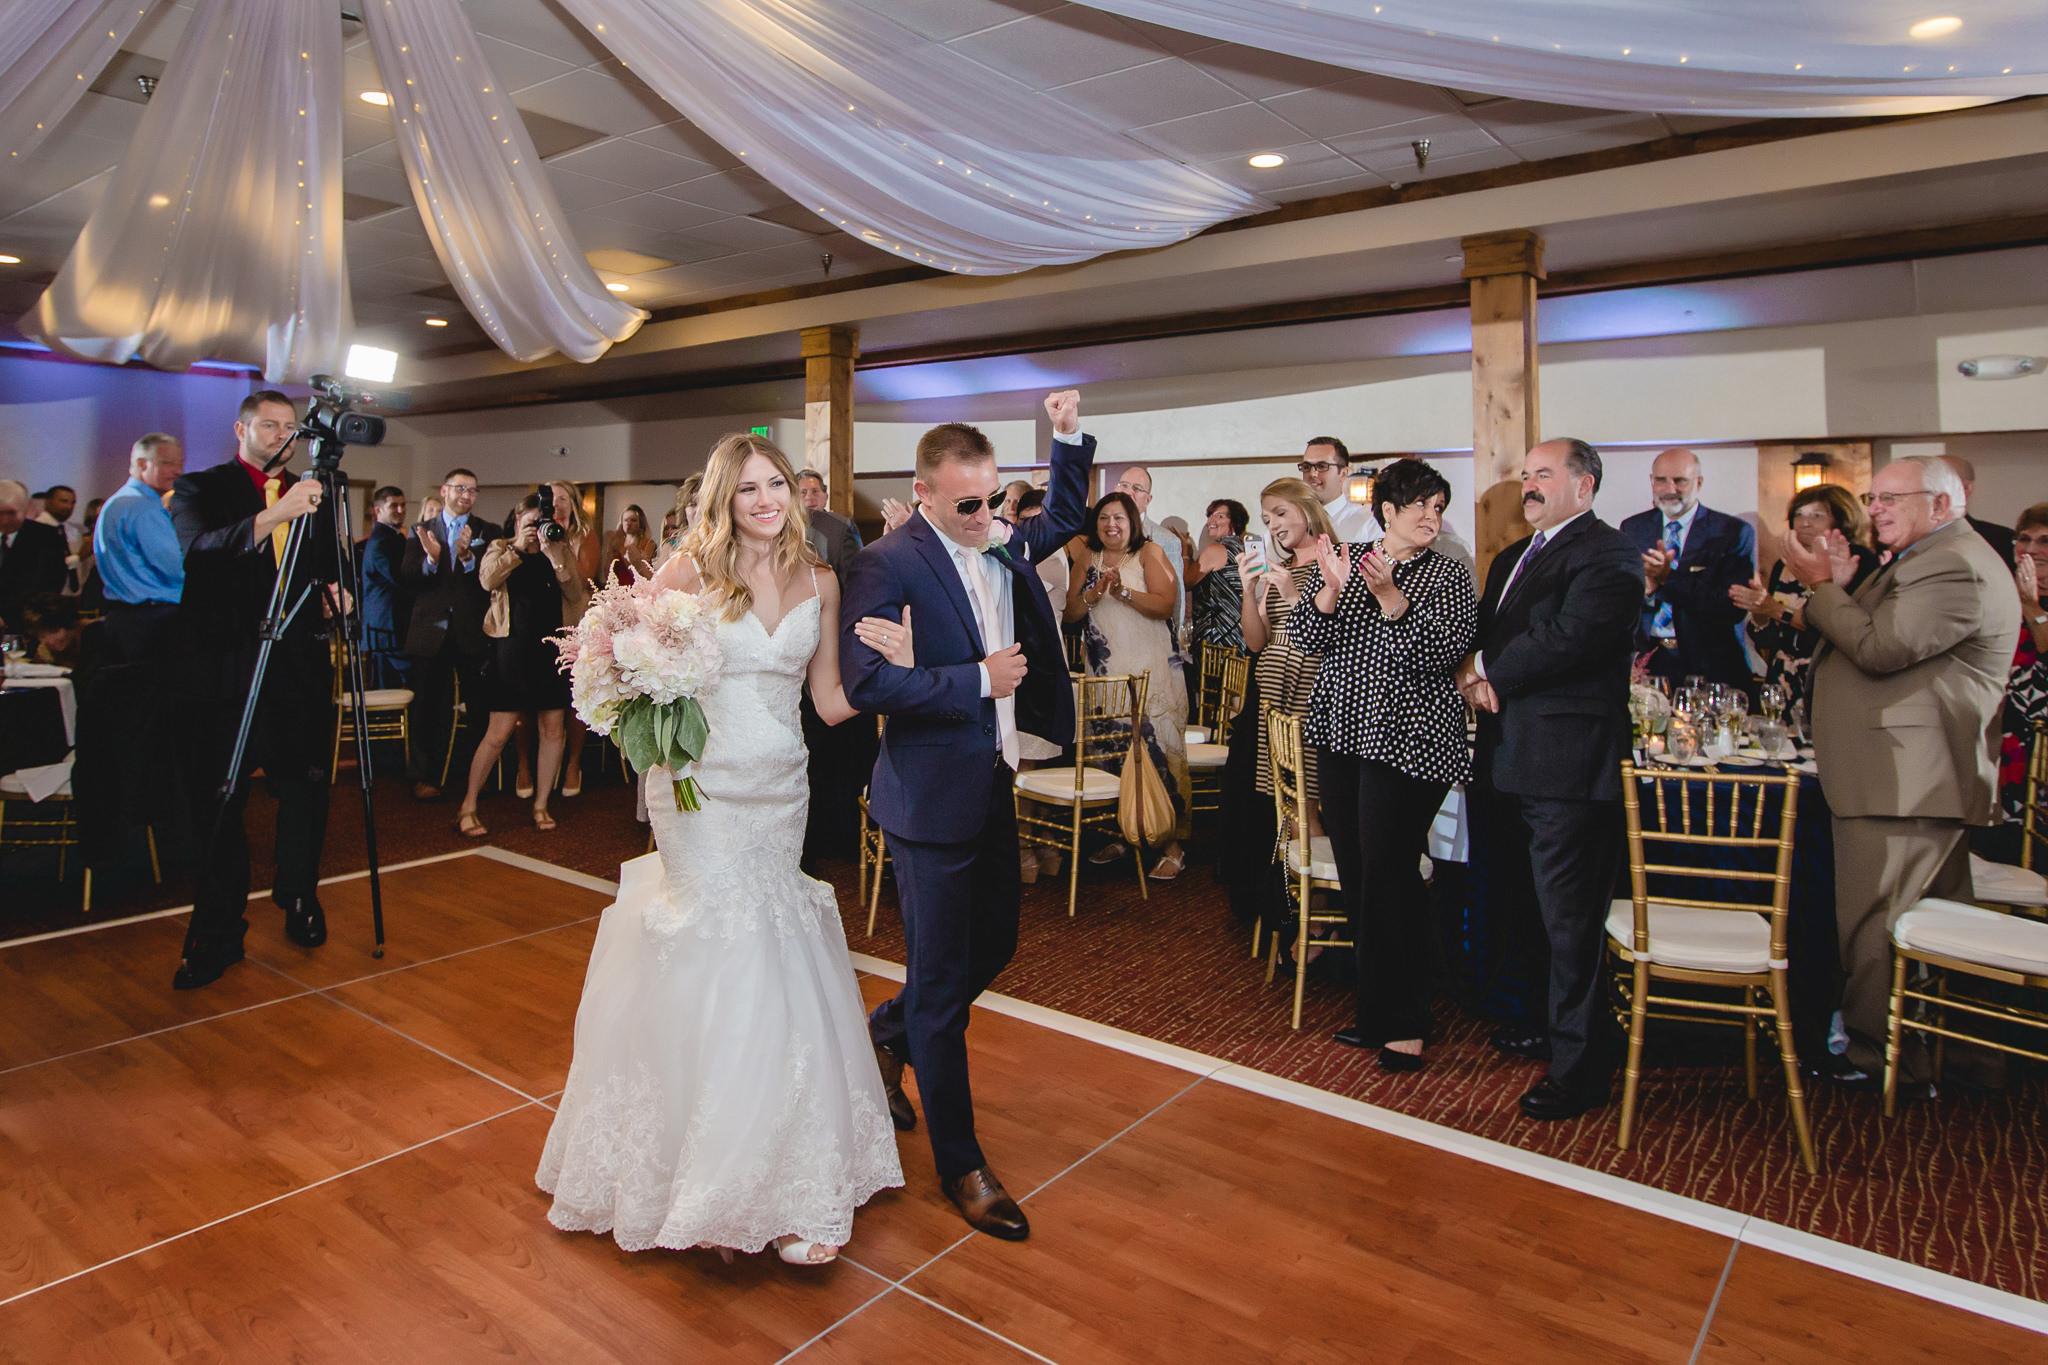 Bride and groom arrive at their Hidden Valley Resort wedding reception